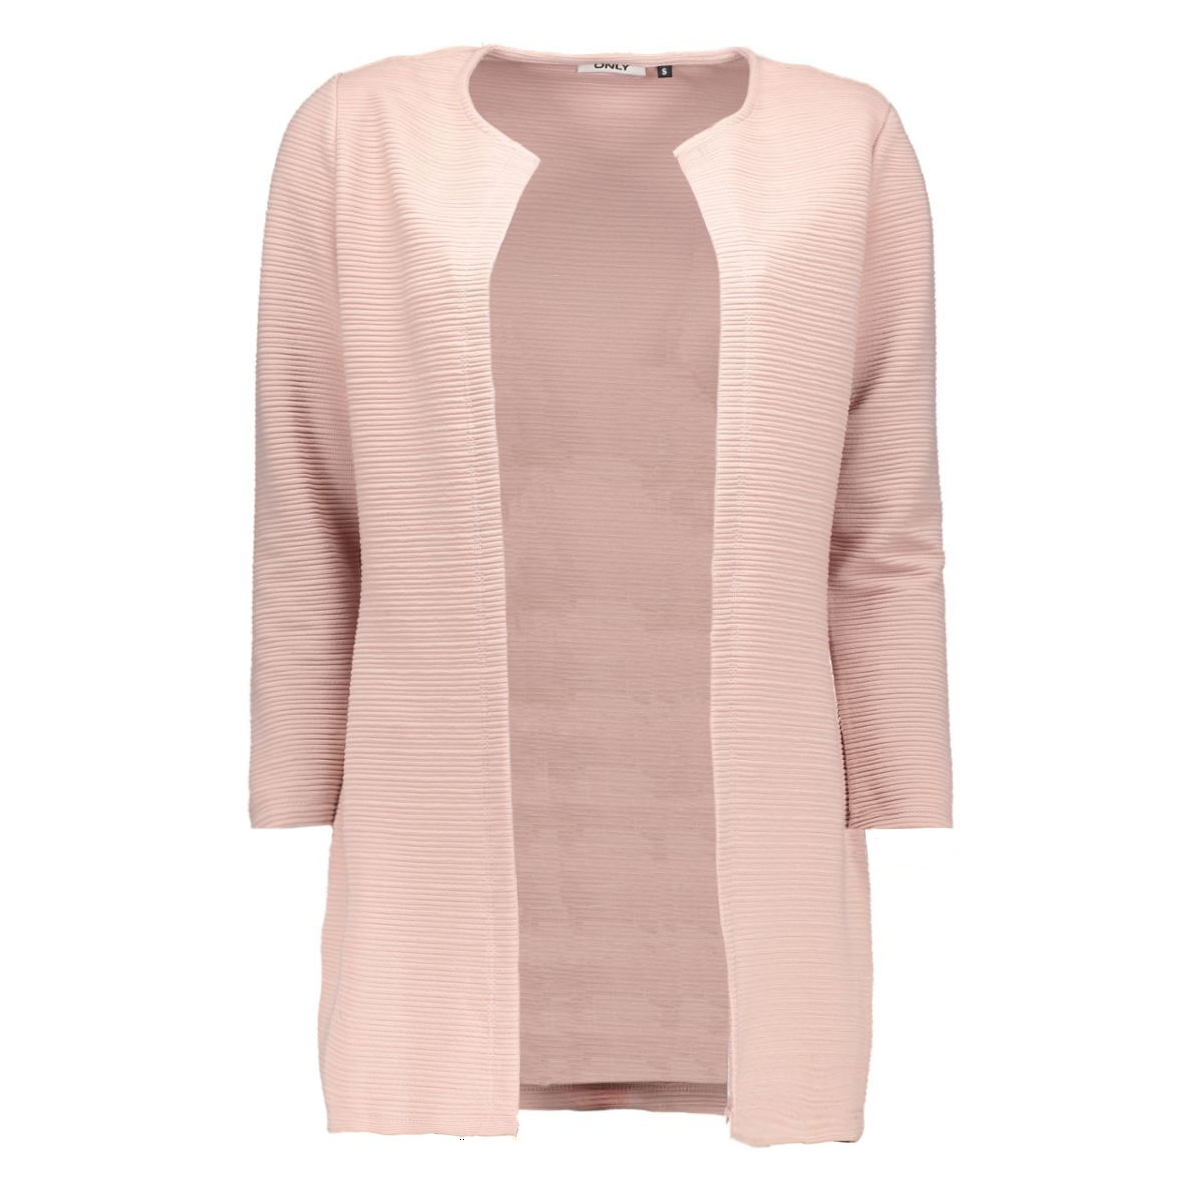 onlleco 7/8 long cardigan jrs noos 15112273 only vest adobe rose